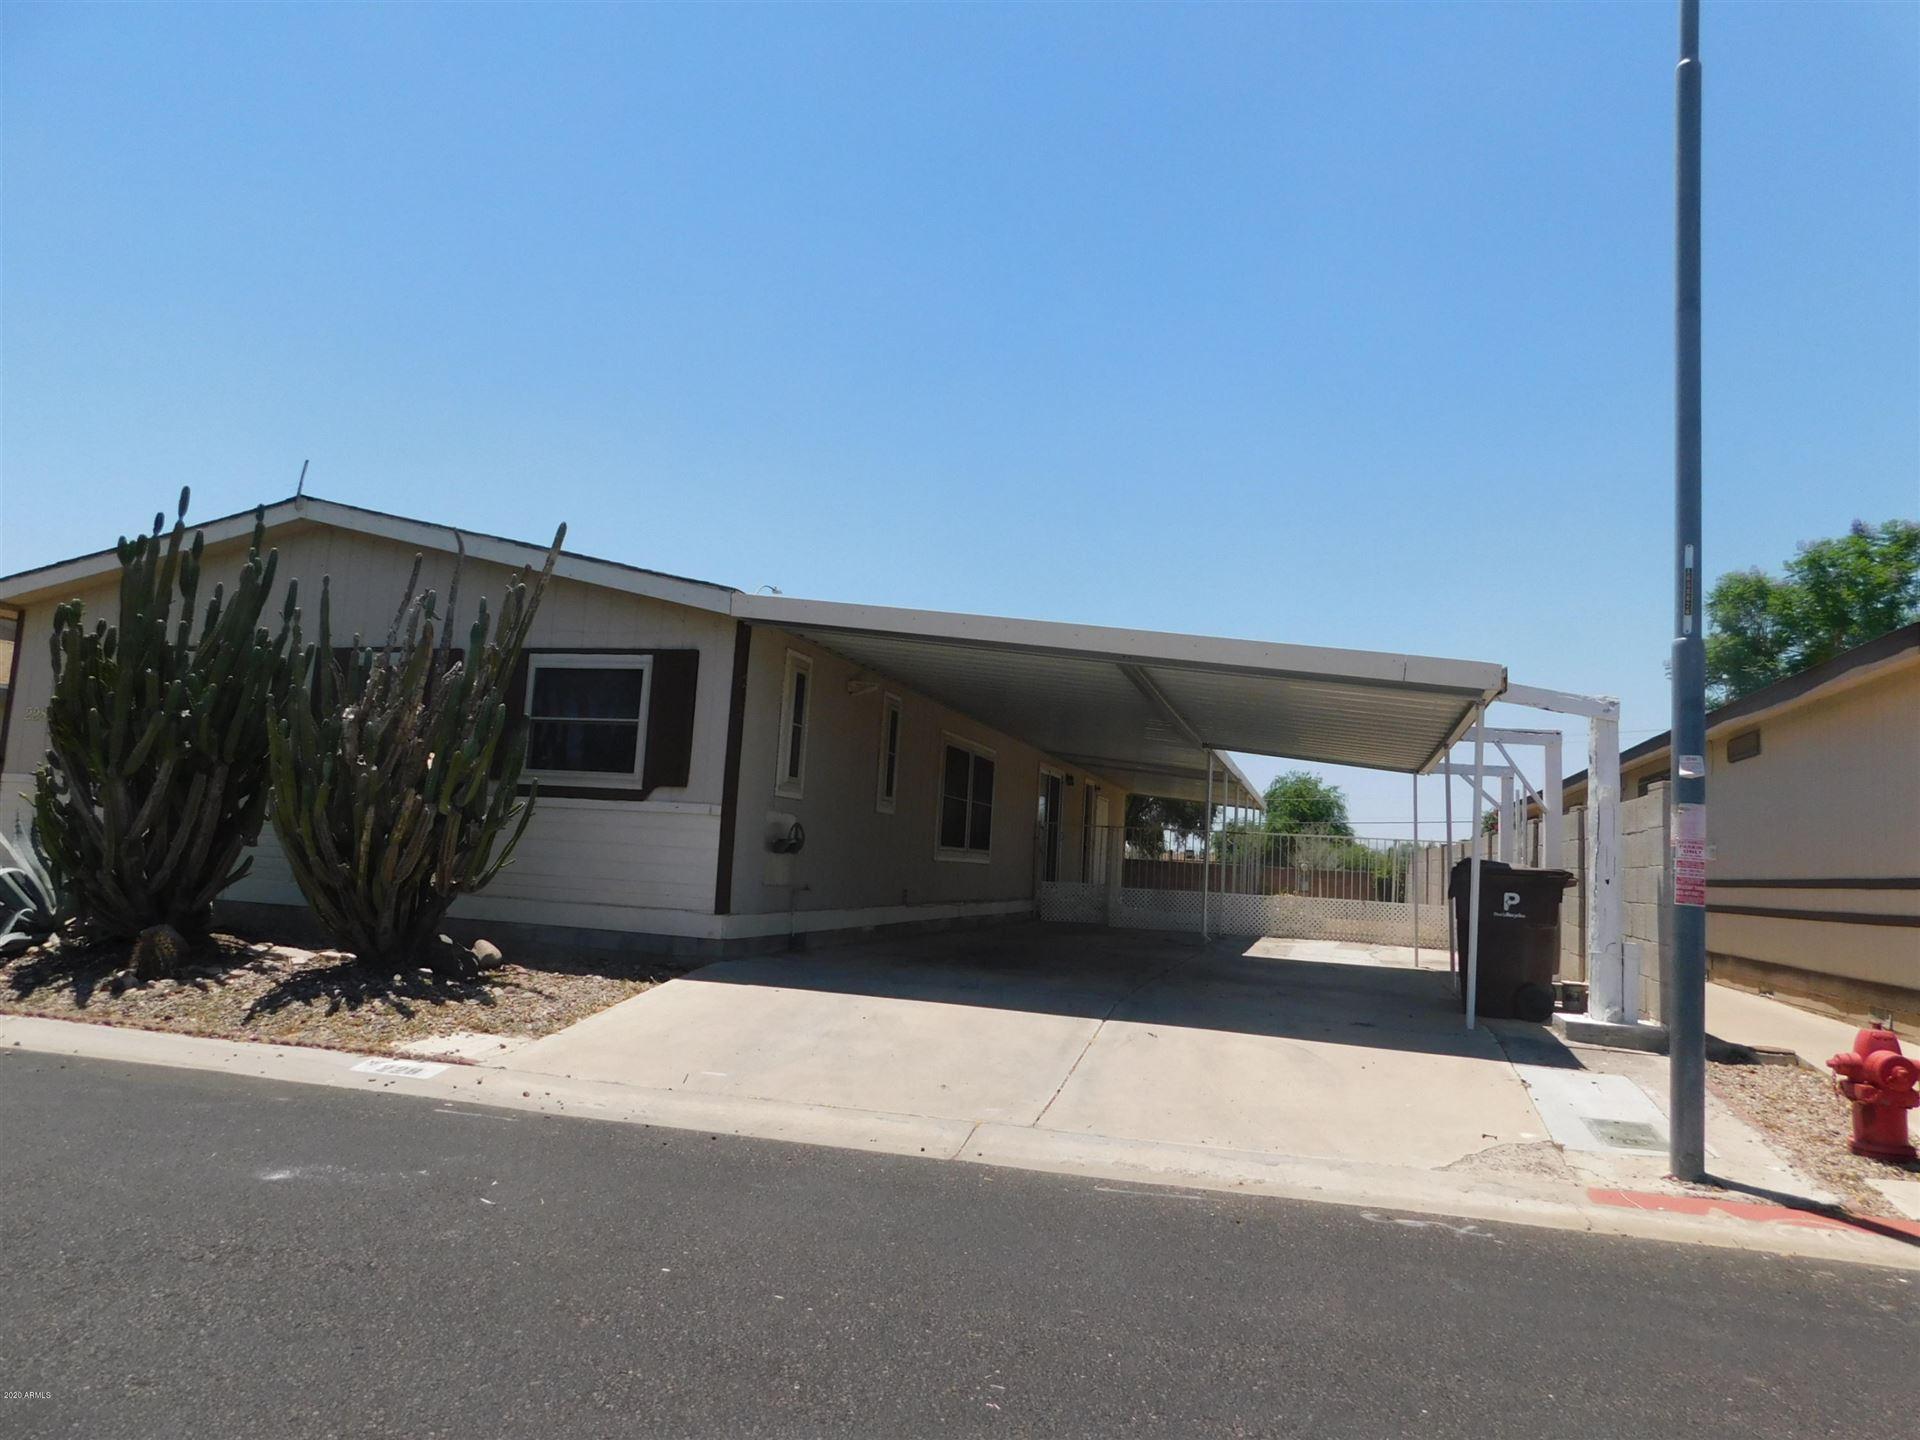 8601 N 103RD Avenue #228, Peoria, AZ 85345 - MLS#: 6091360